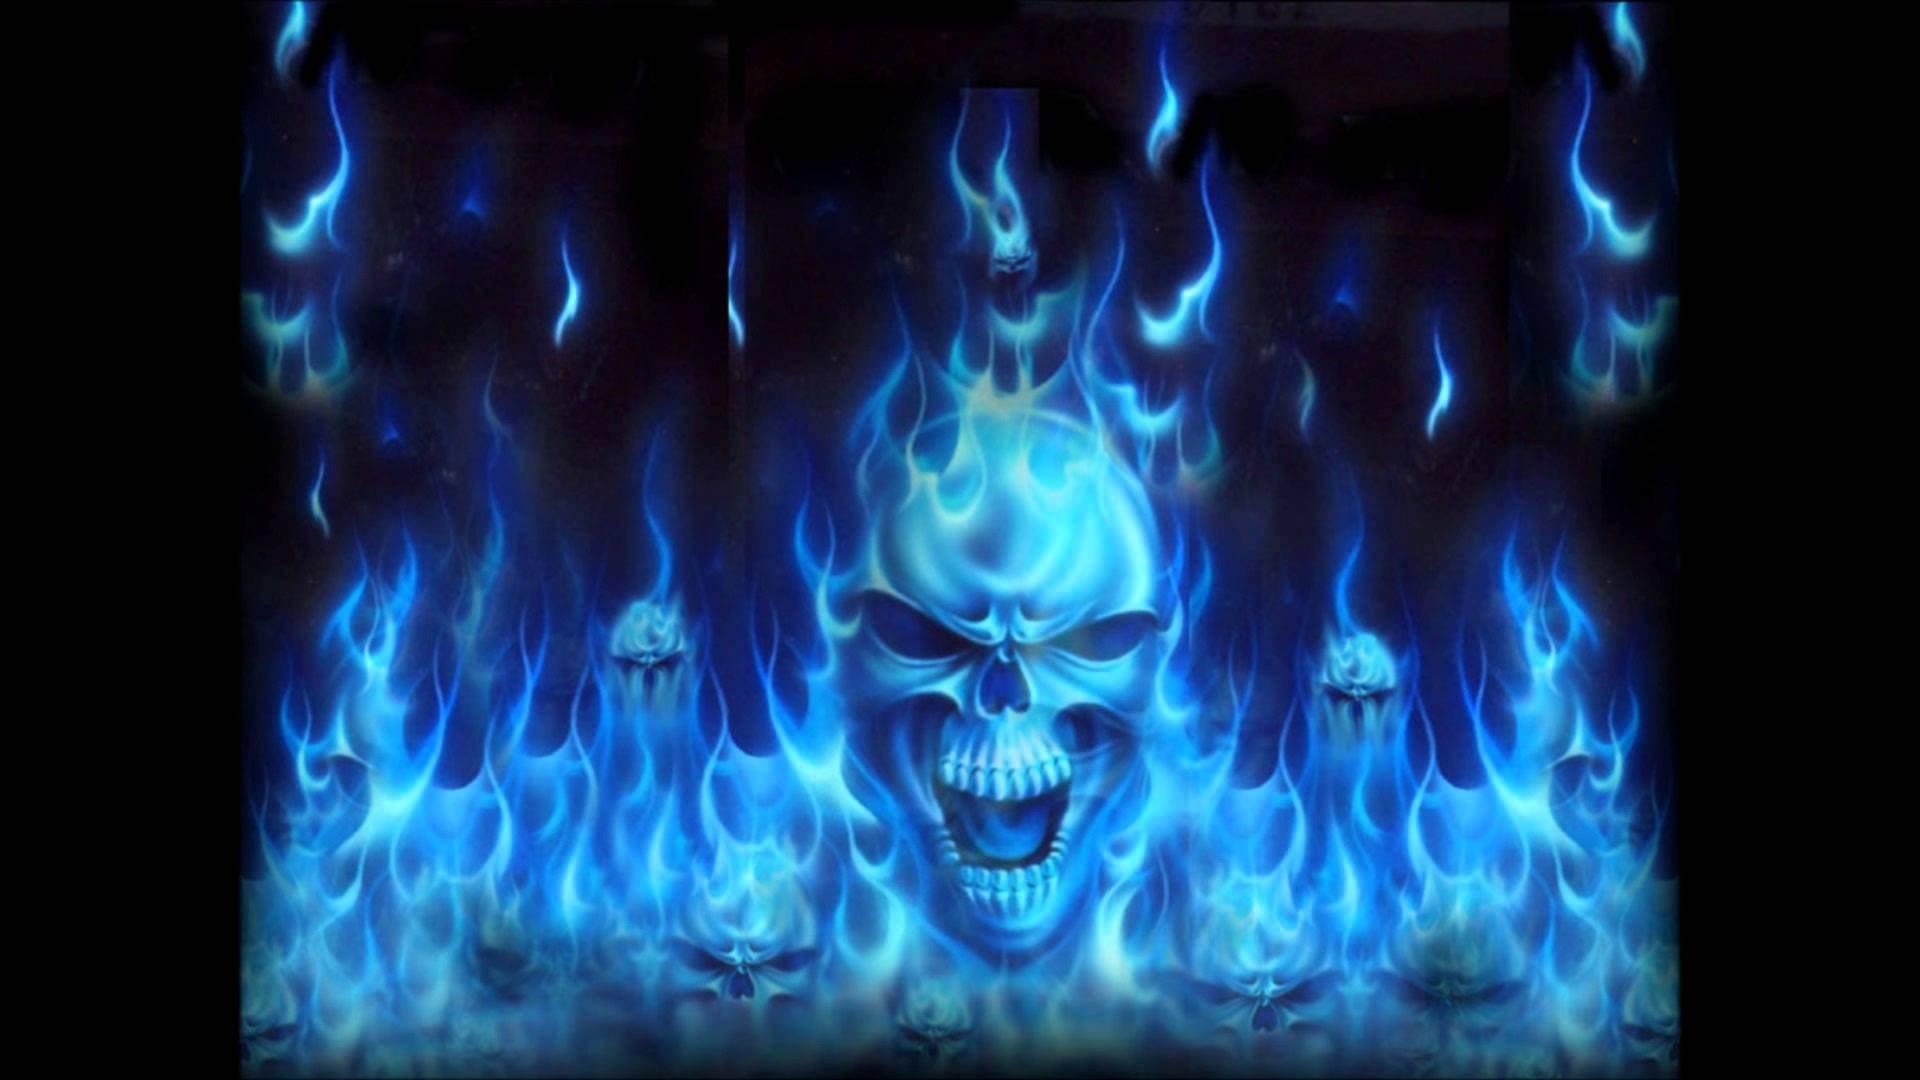 Flaming Skulls Wallpaper 59 Images